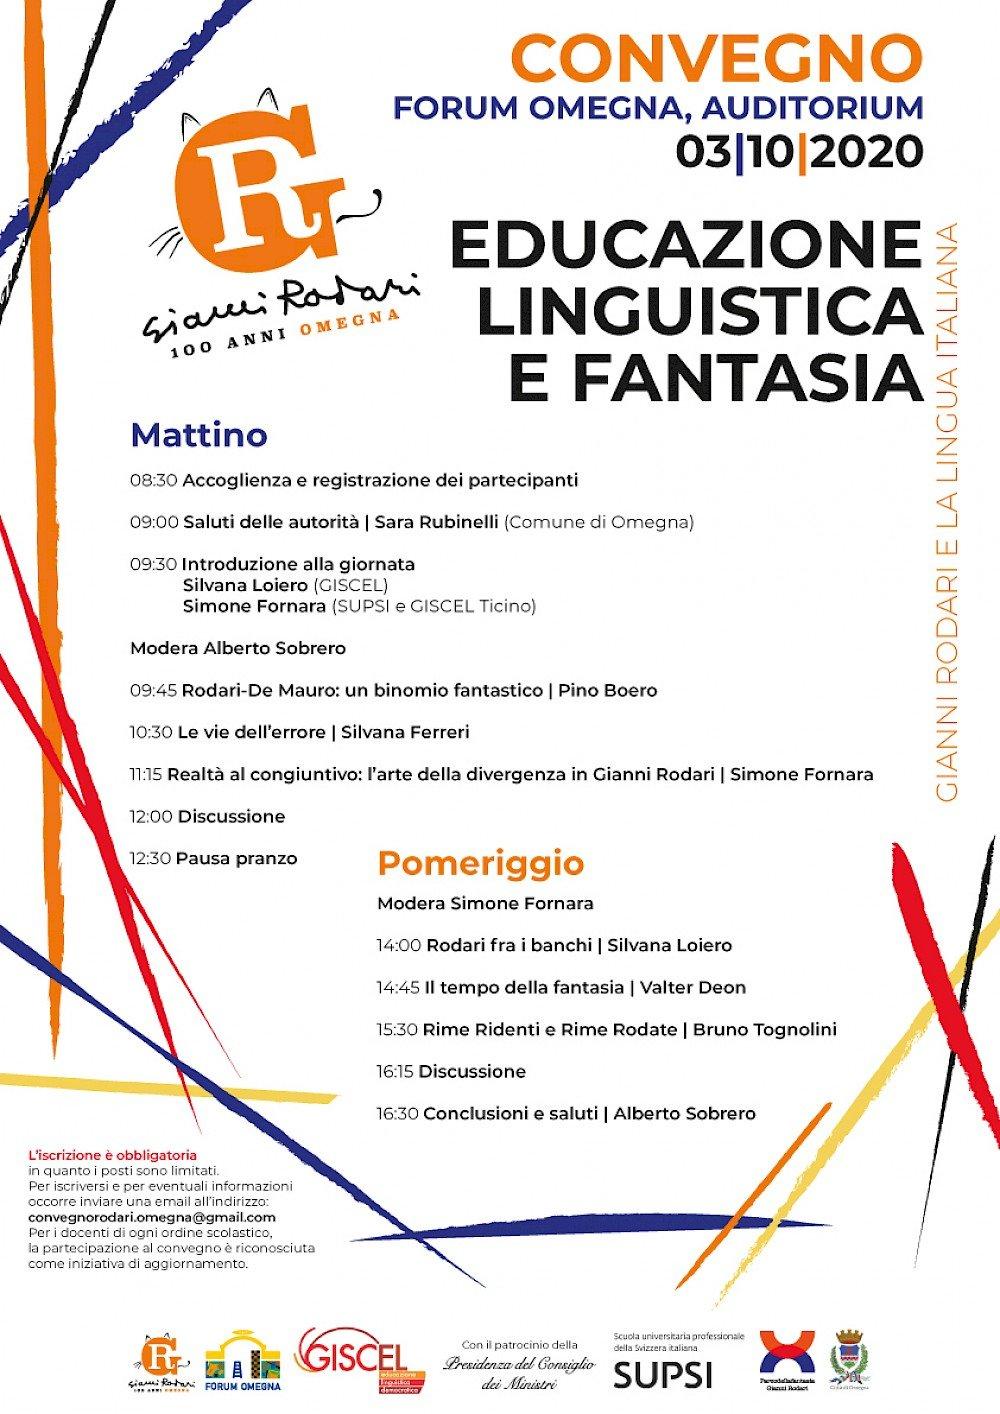 Educazione linguistica e fantasia. Gianni Rodari e la lingua italiana